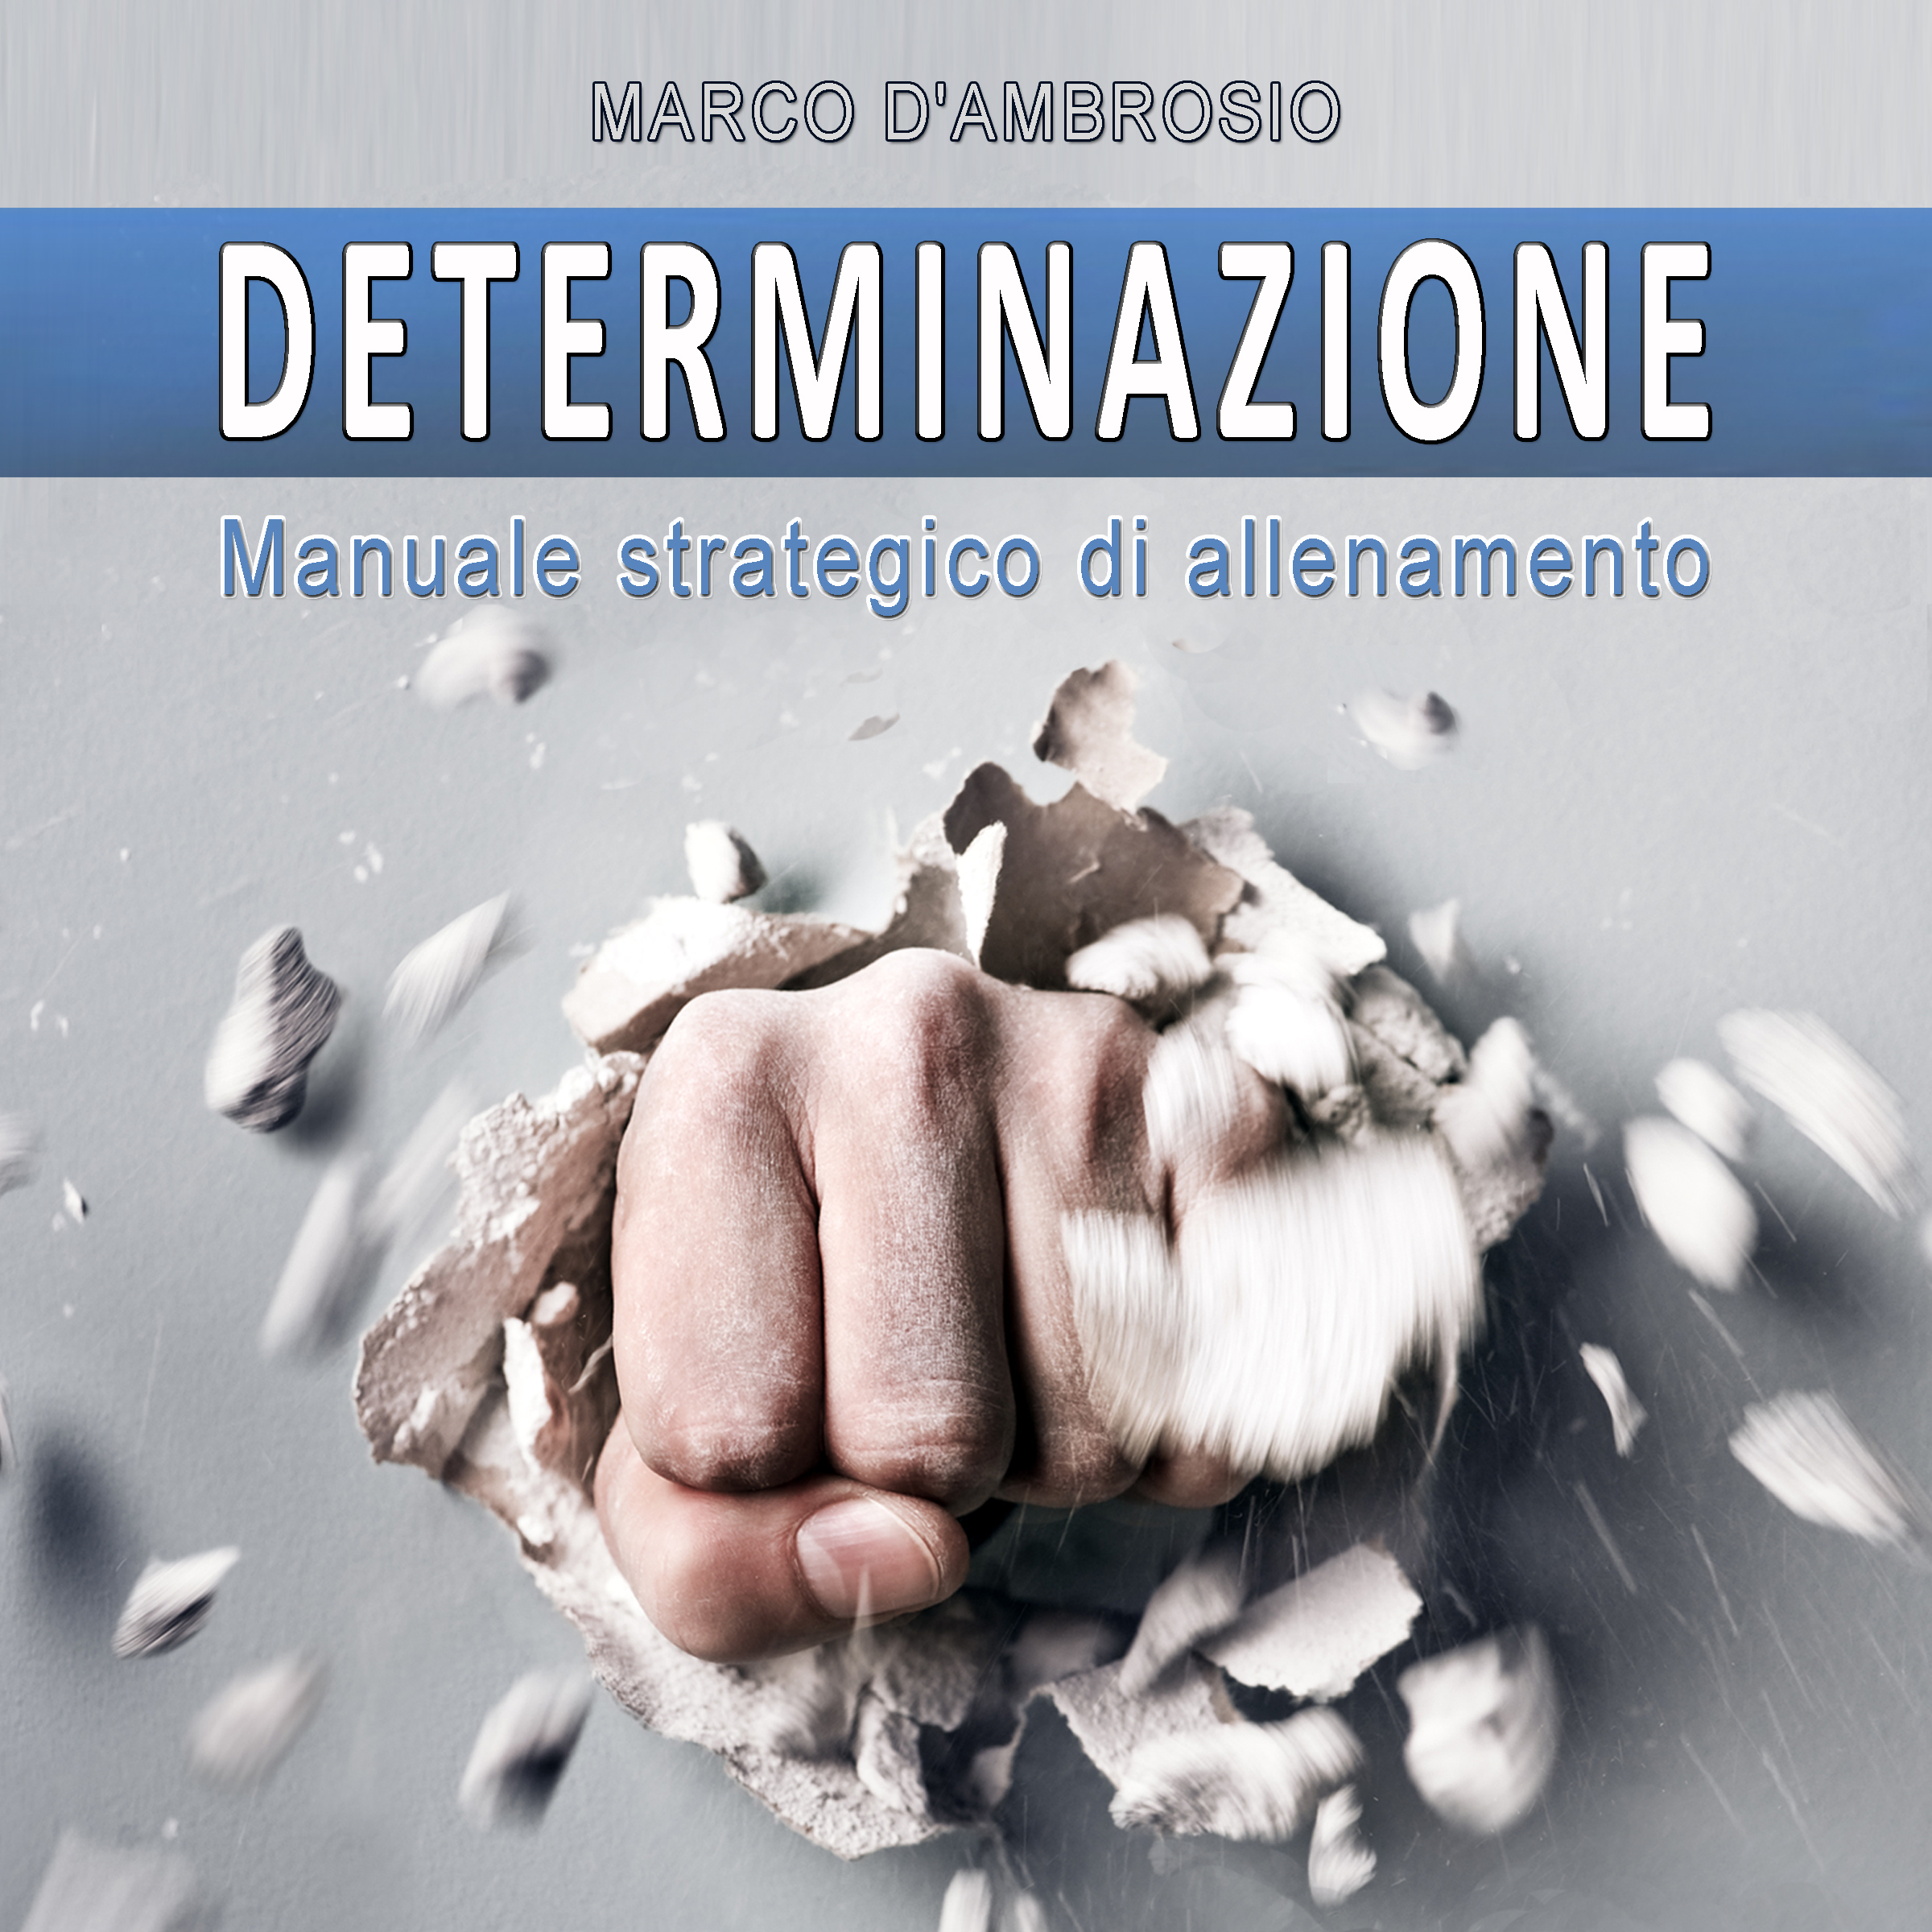 Determinazione-0